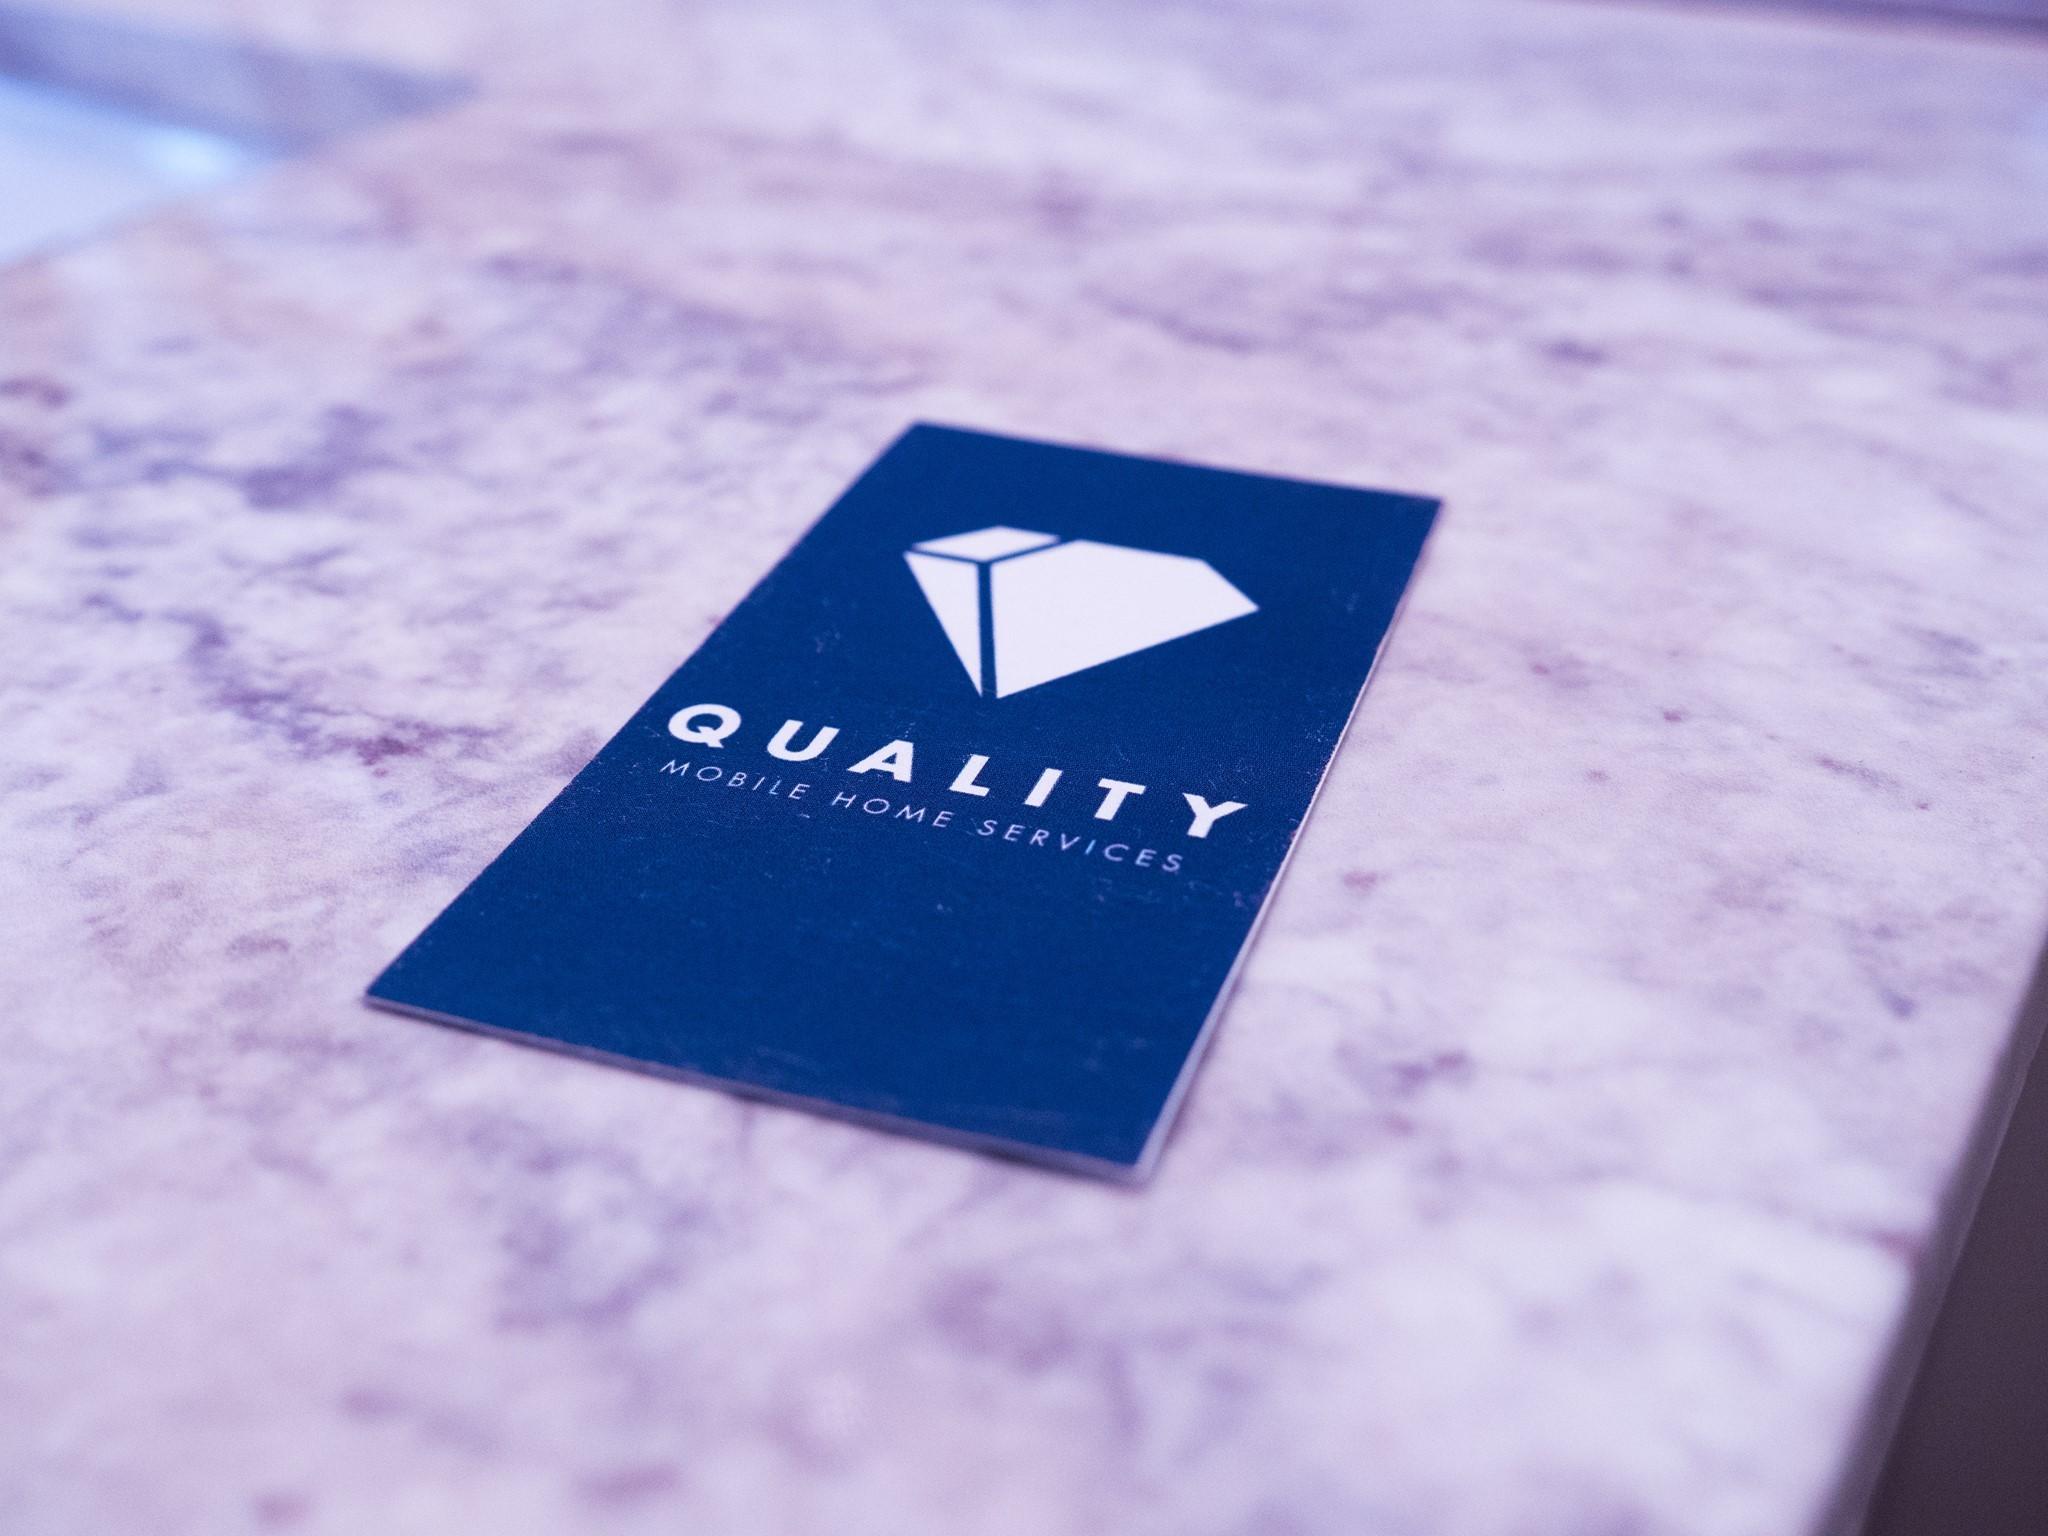 Quality Mobile Home Services Inc  | LinkedIn